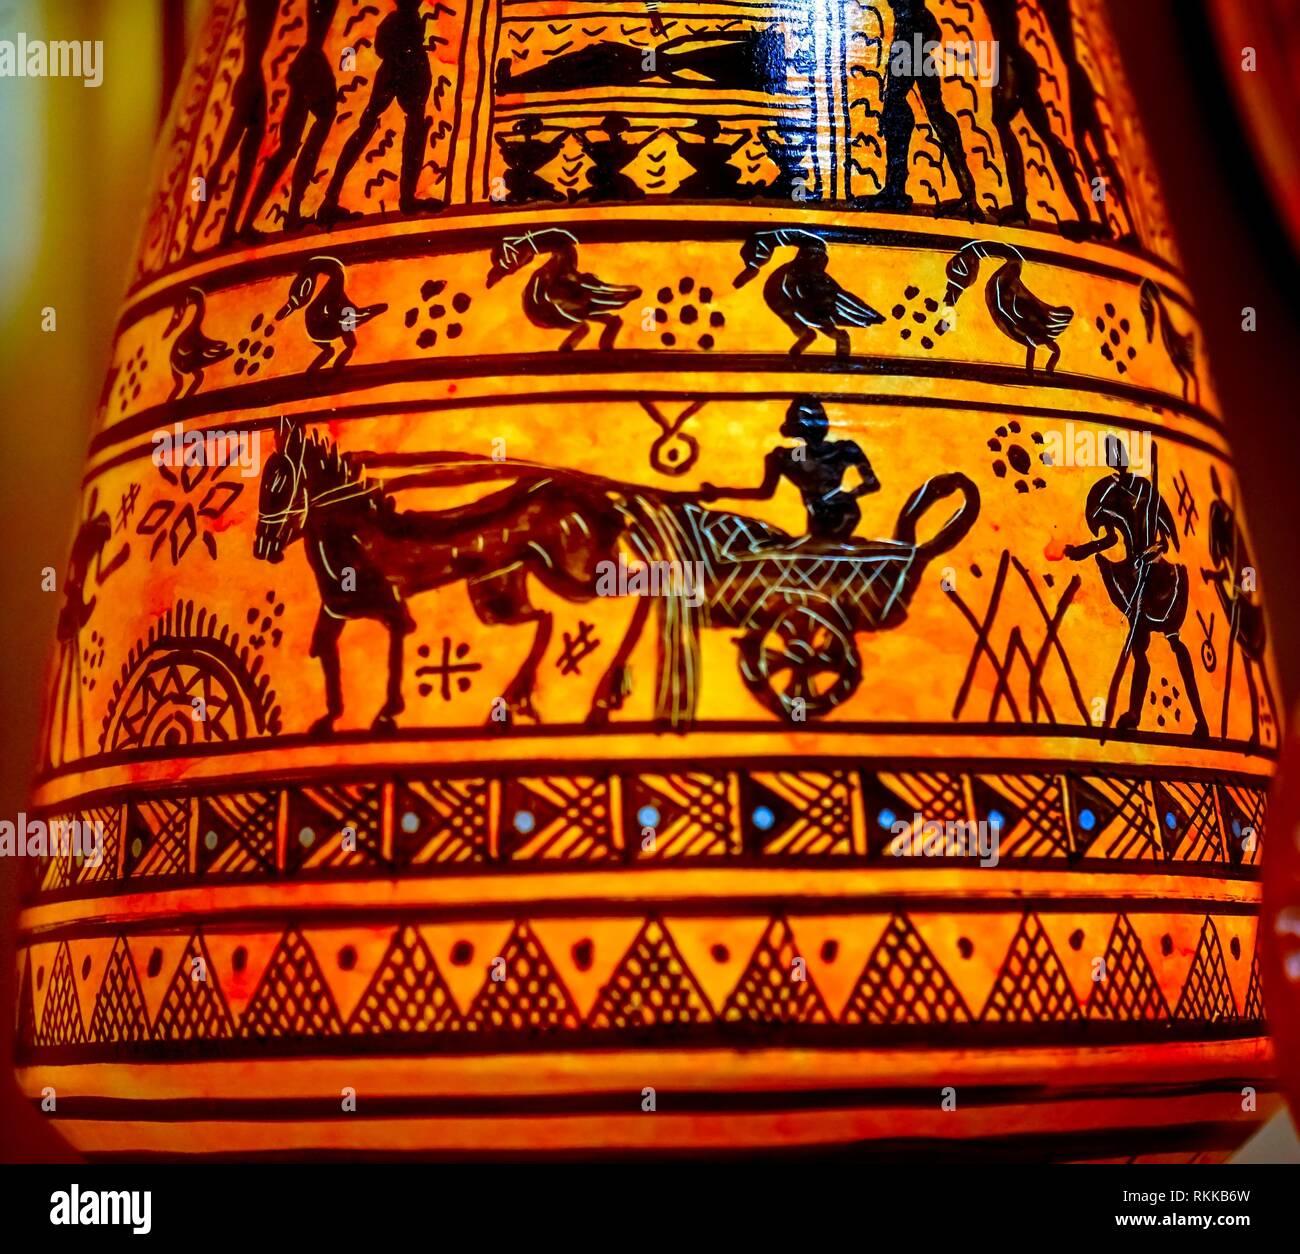 Greek Antiquity Pottery Stock Photos & Greek Antiquity